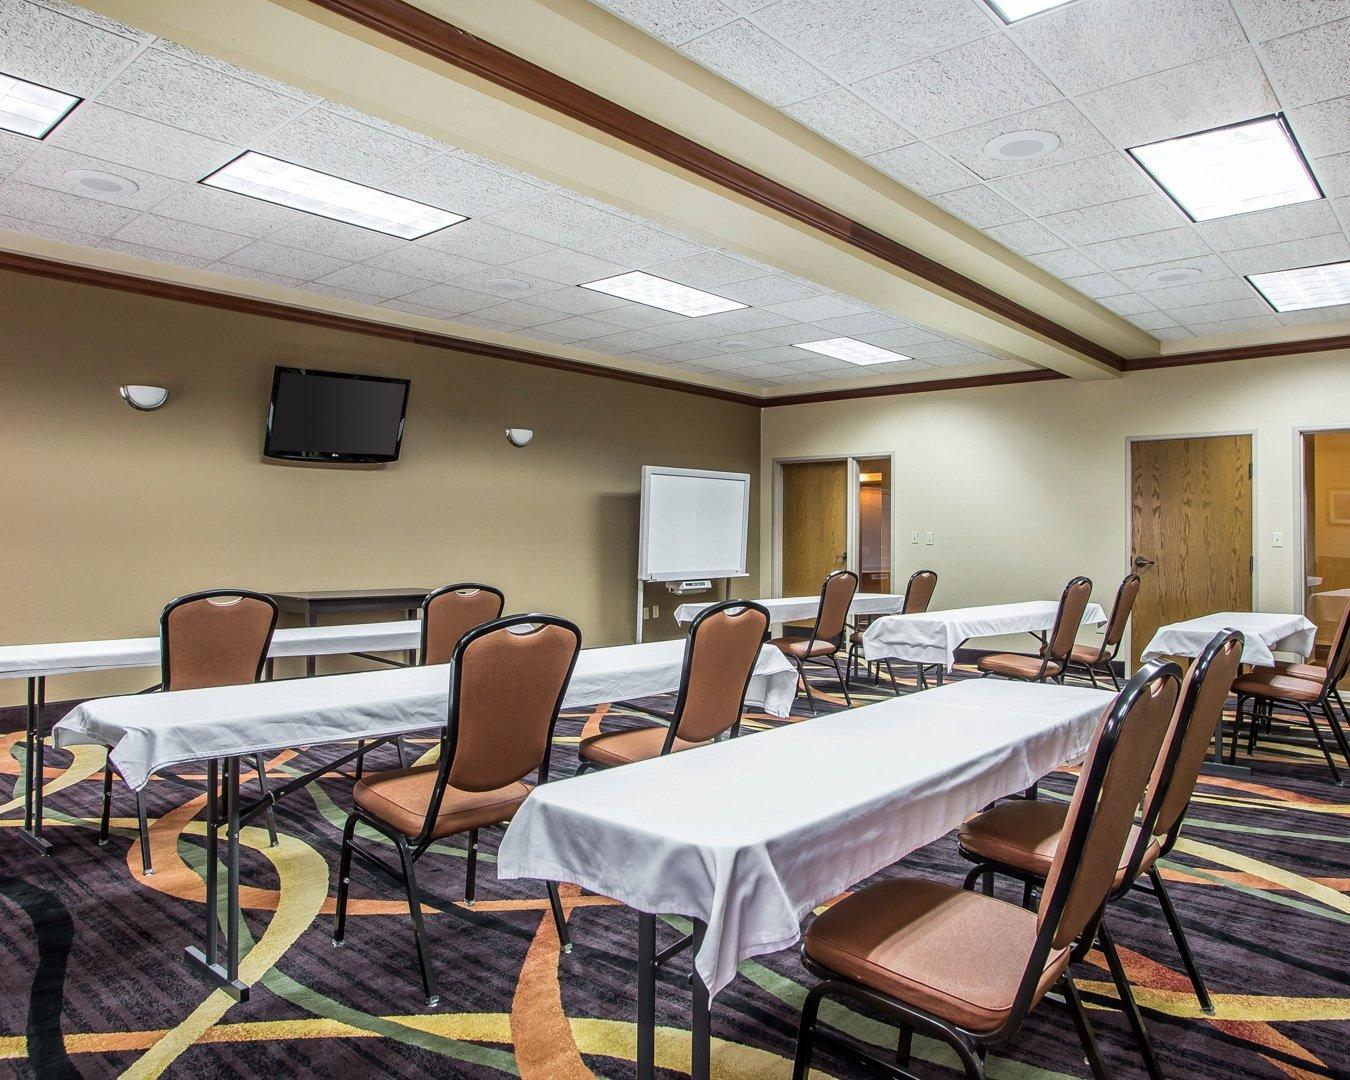 Comfort Inn & Suites in Kenosha, WI   Whitepages